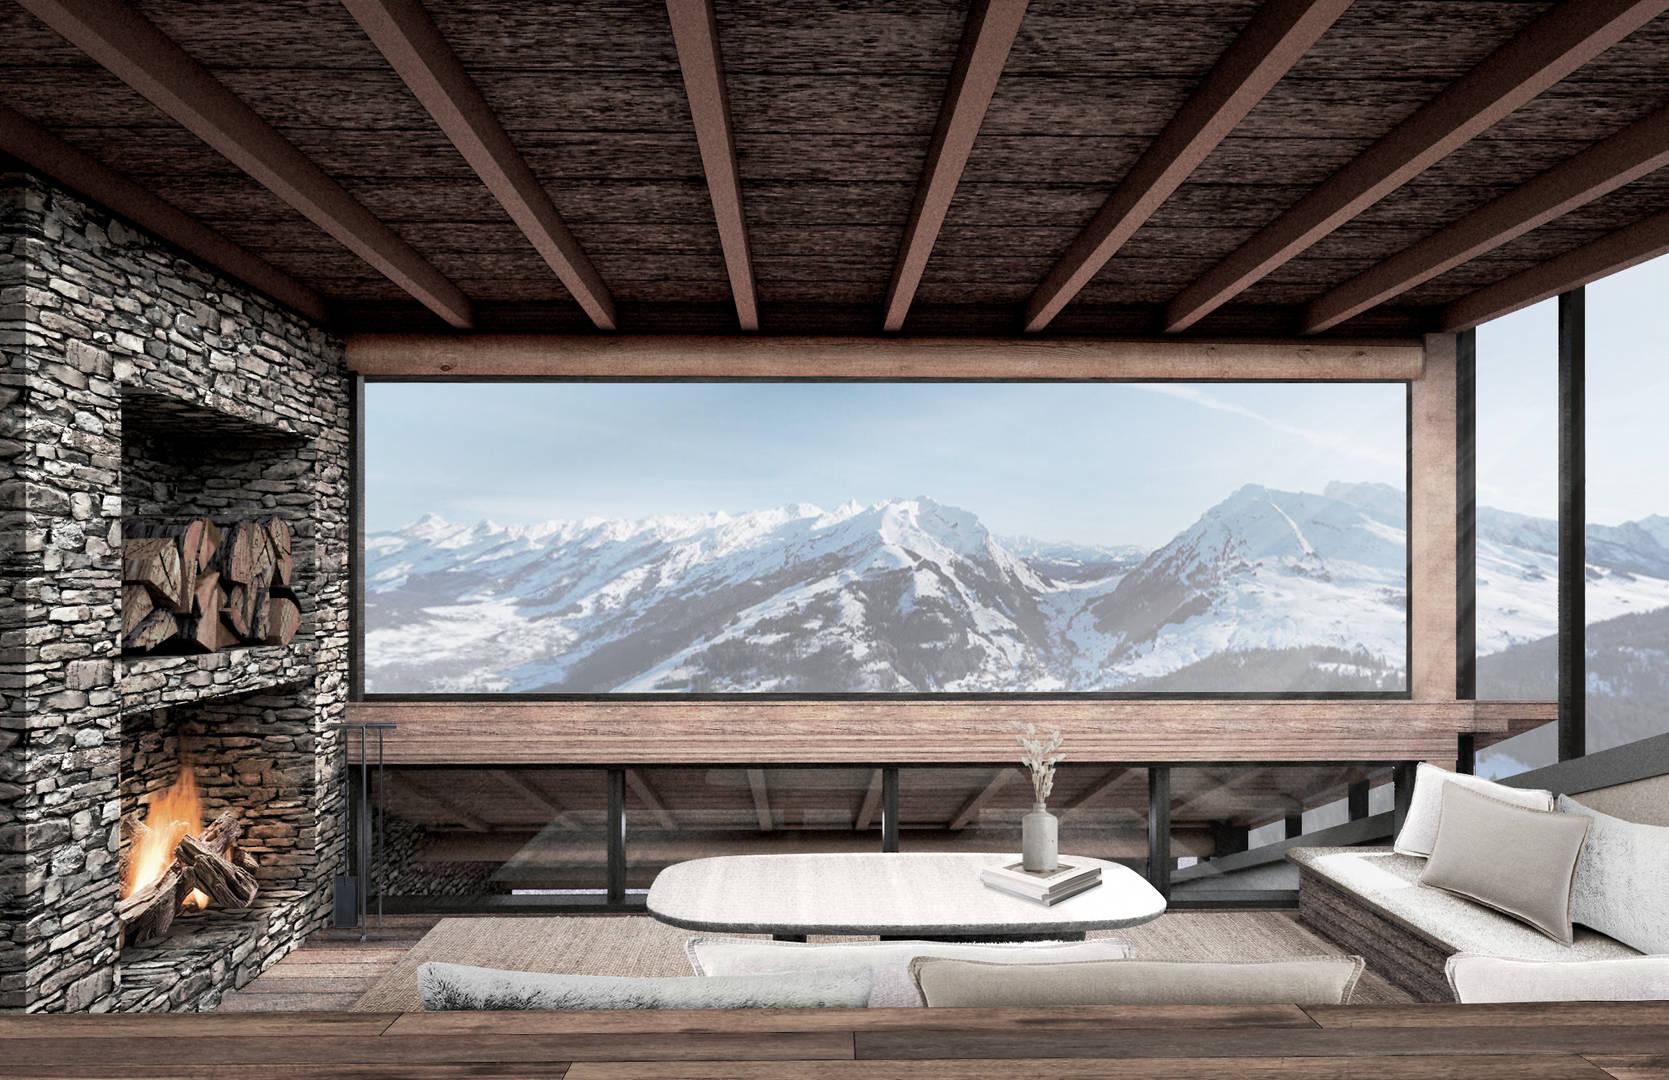 Lobby Fireplace View.jpg